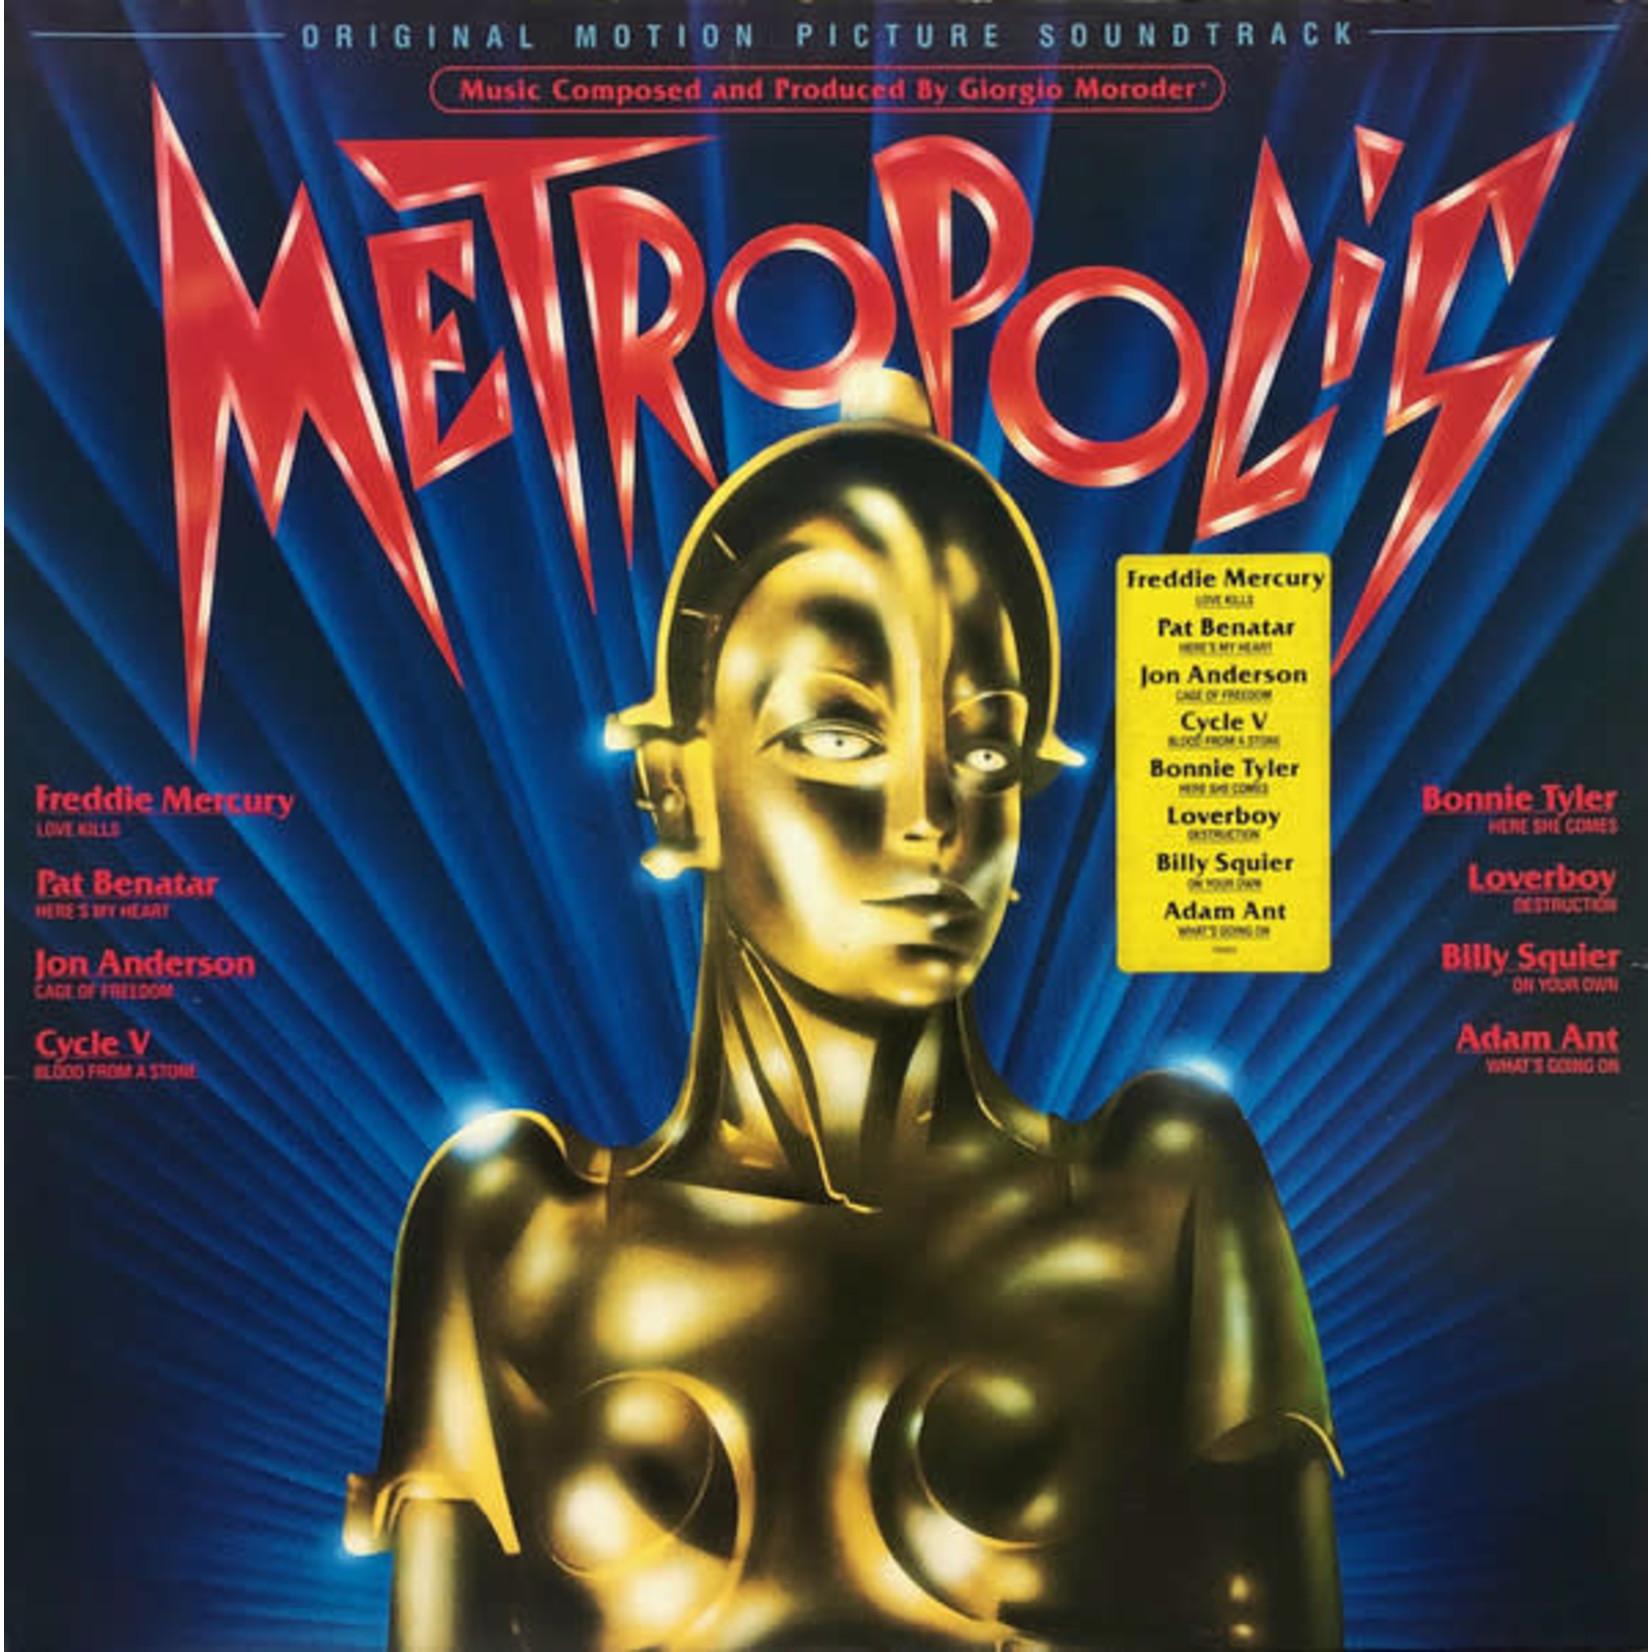 [Vintage] Various: Metropolis (Soundtrack)